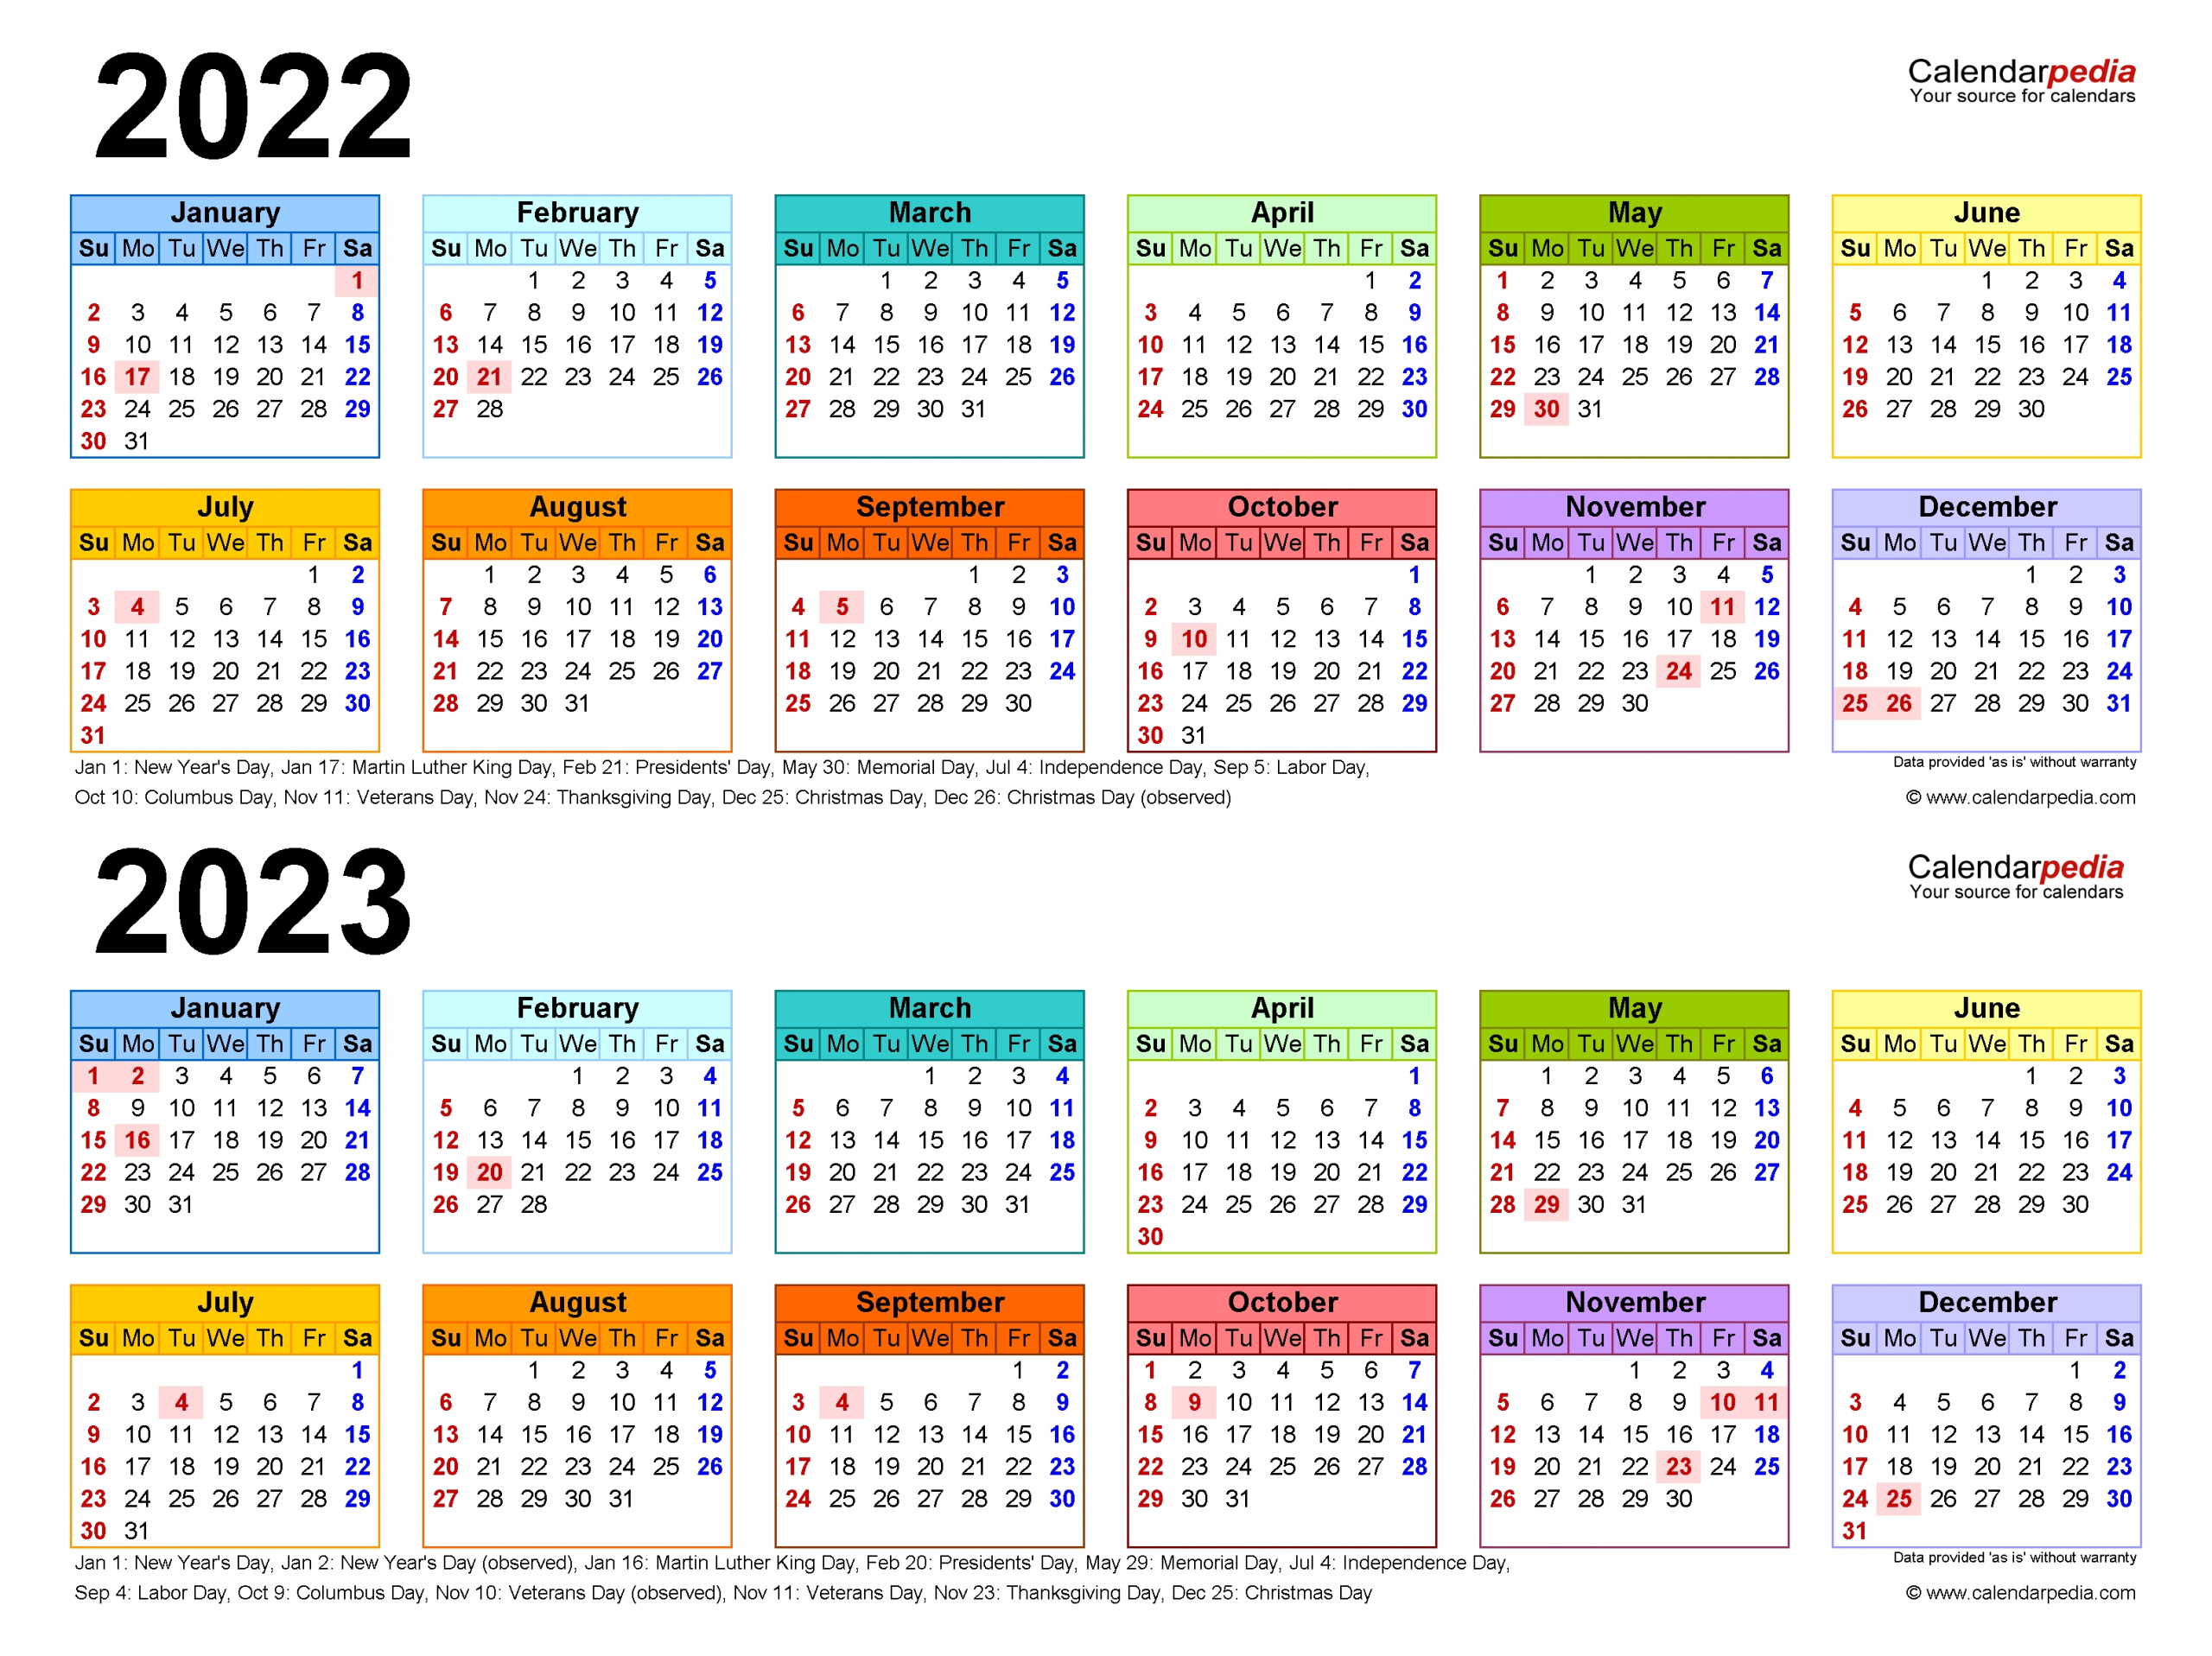 2022-2023 Two Year Calendar - Free Printable Pdf Templates